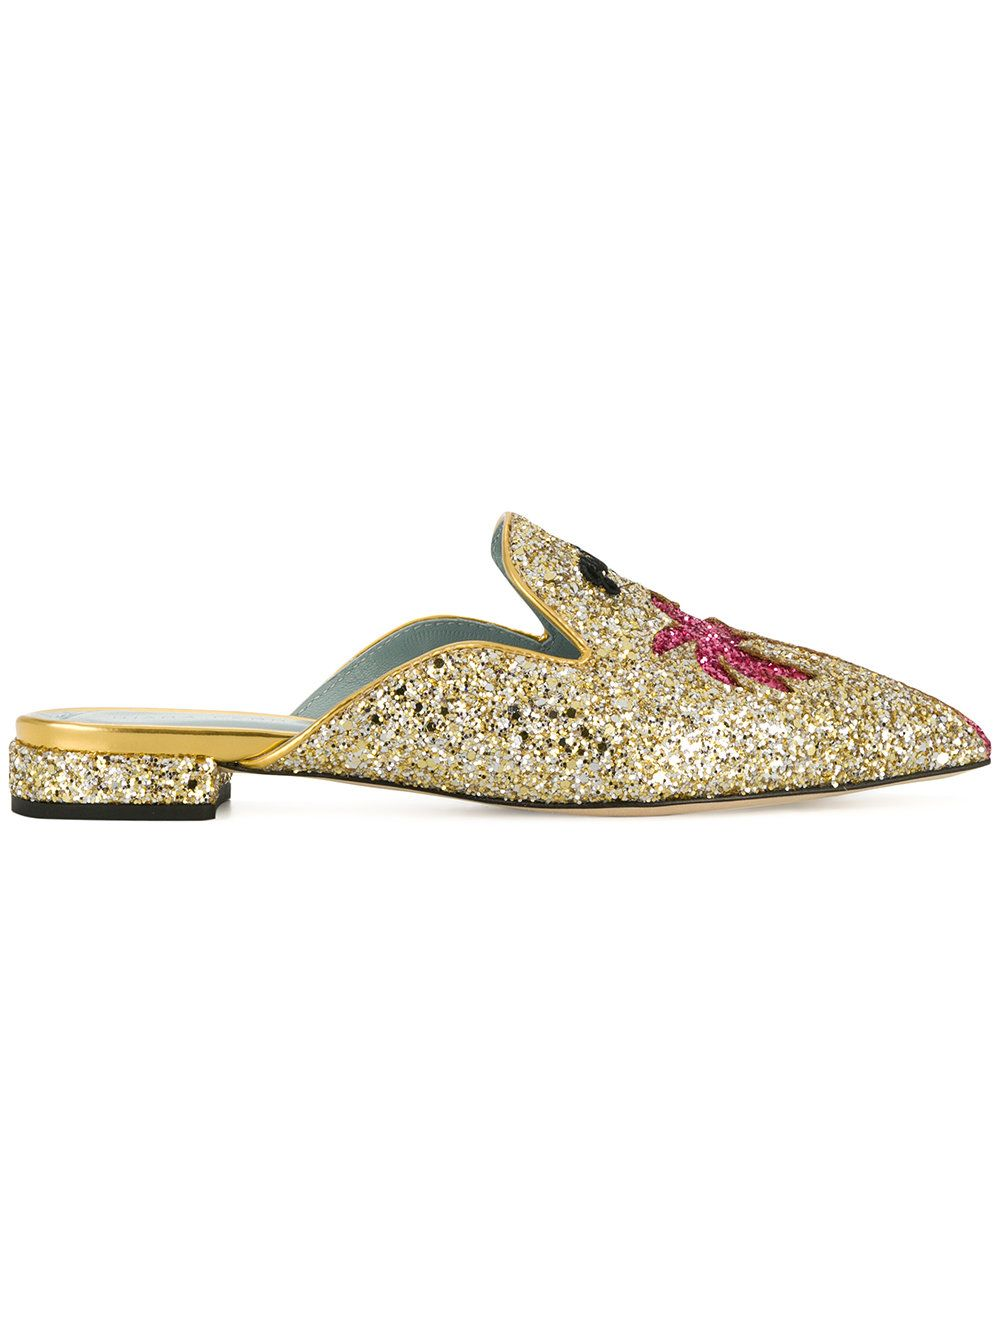 Chiara Ferragni Suite Life Glitter Pointy Mules In Gold